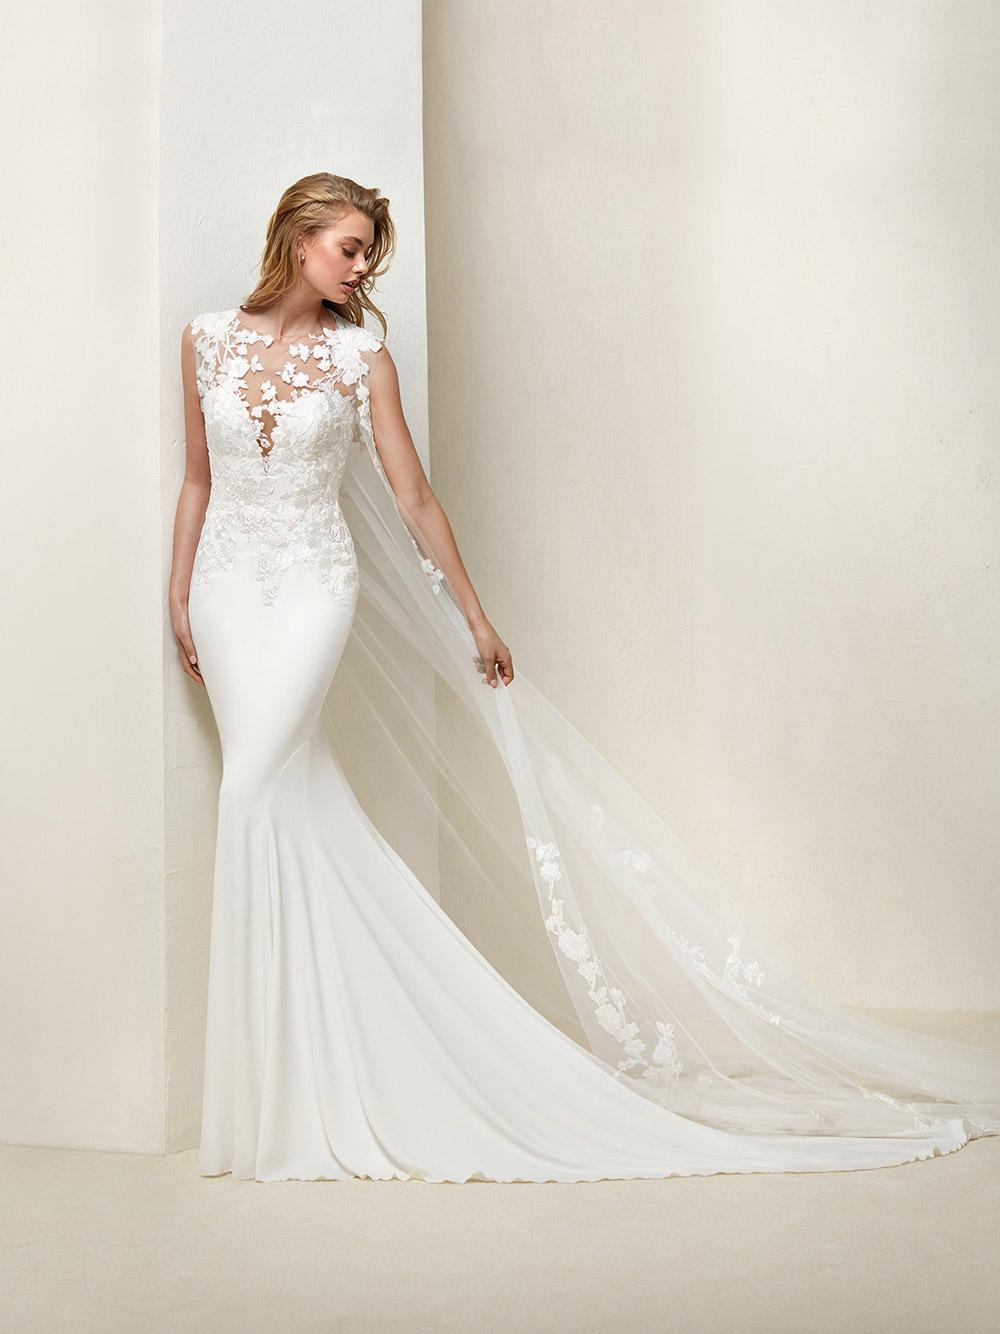 Drail - Pronovias 2018 Bridal Collection. www.theweddingnotebook.com